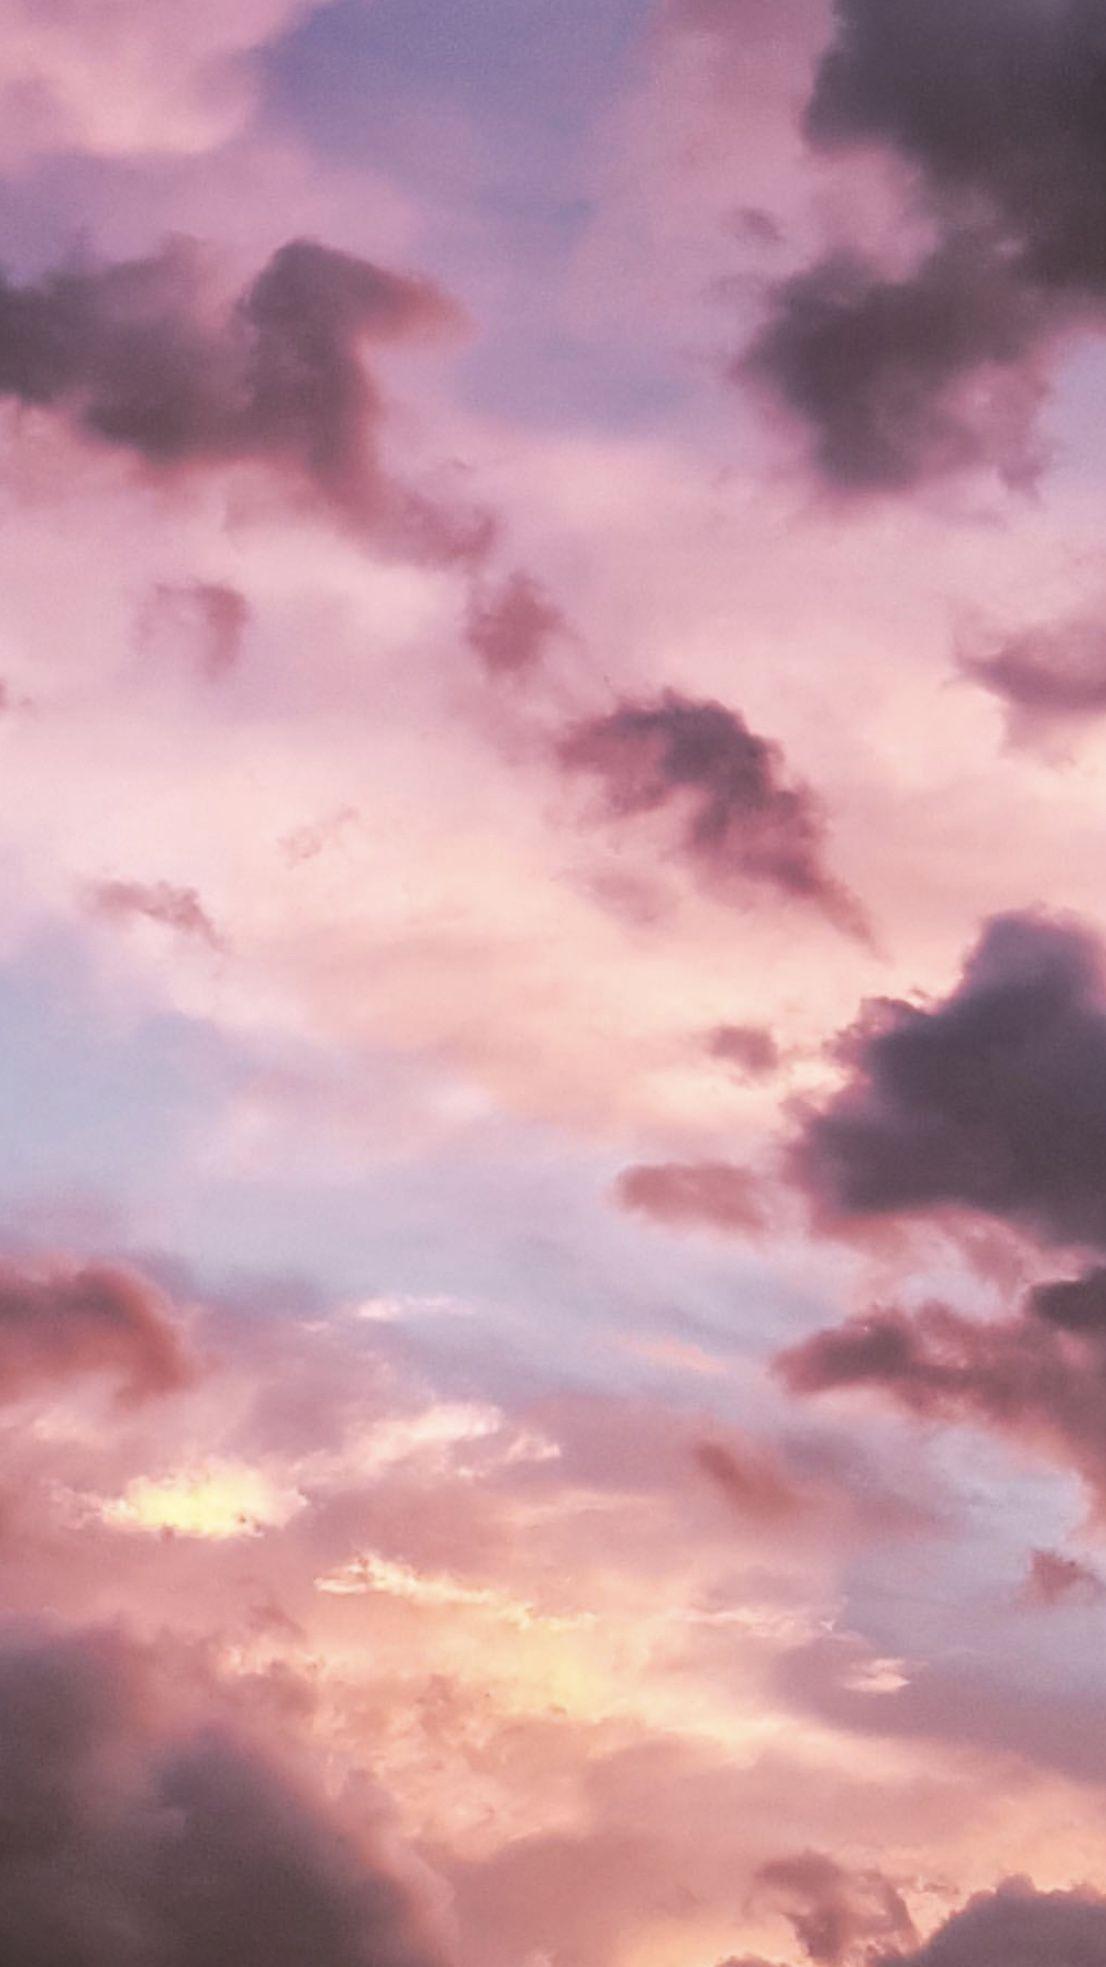 Pin By Jisel On Wallpapers In 2019 Cloud Wallpaper Pink